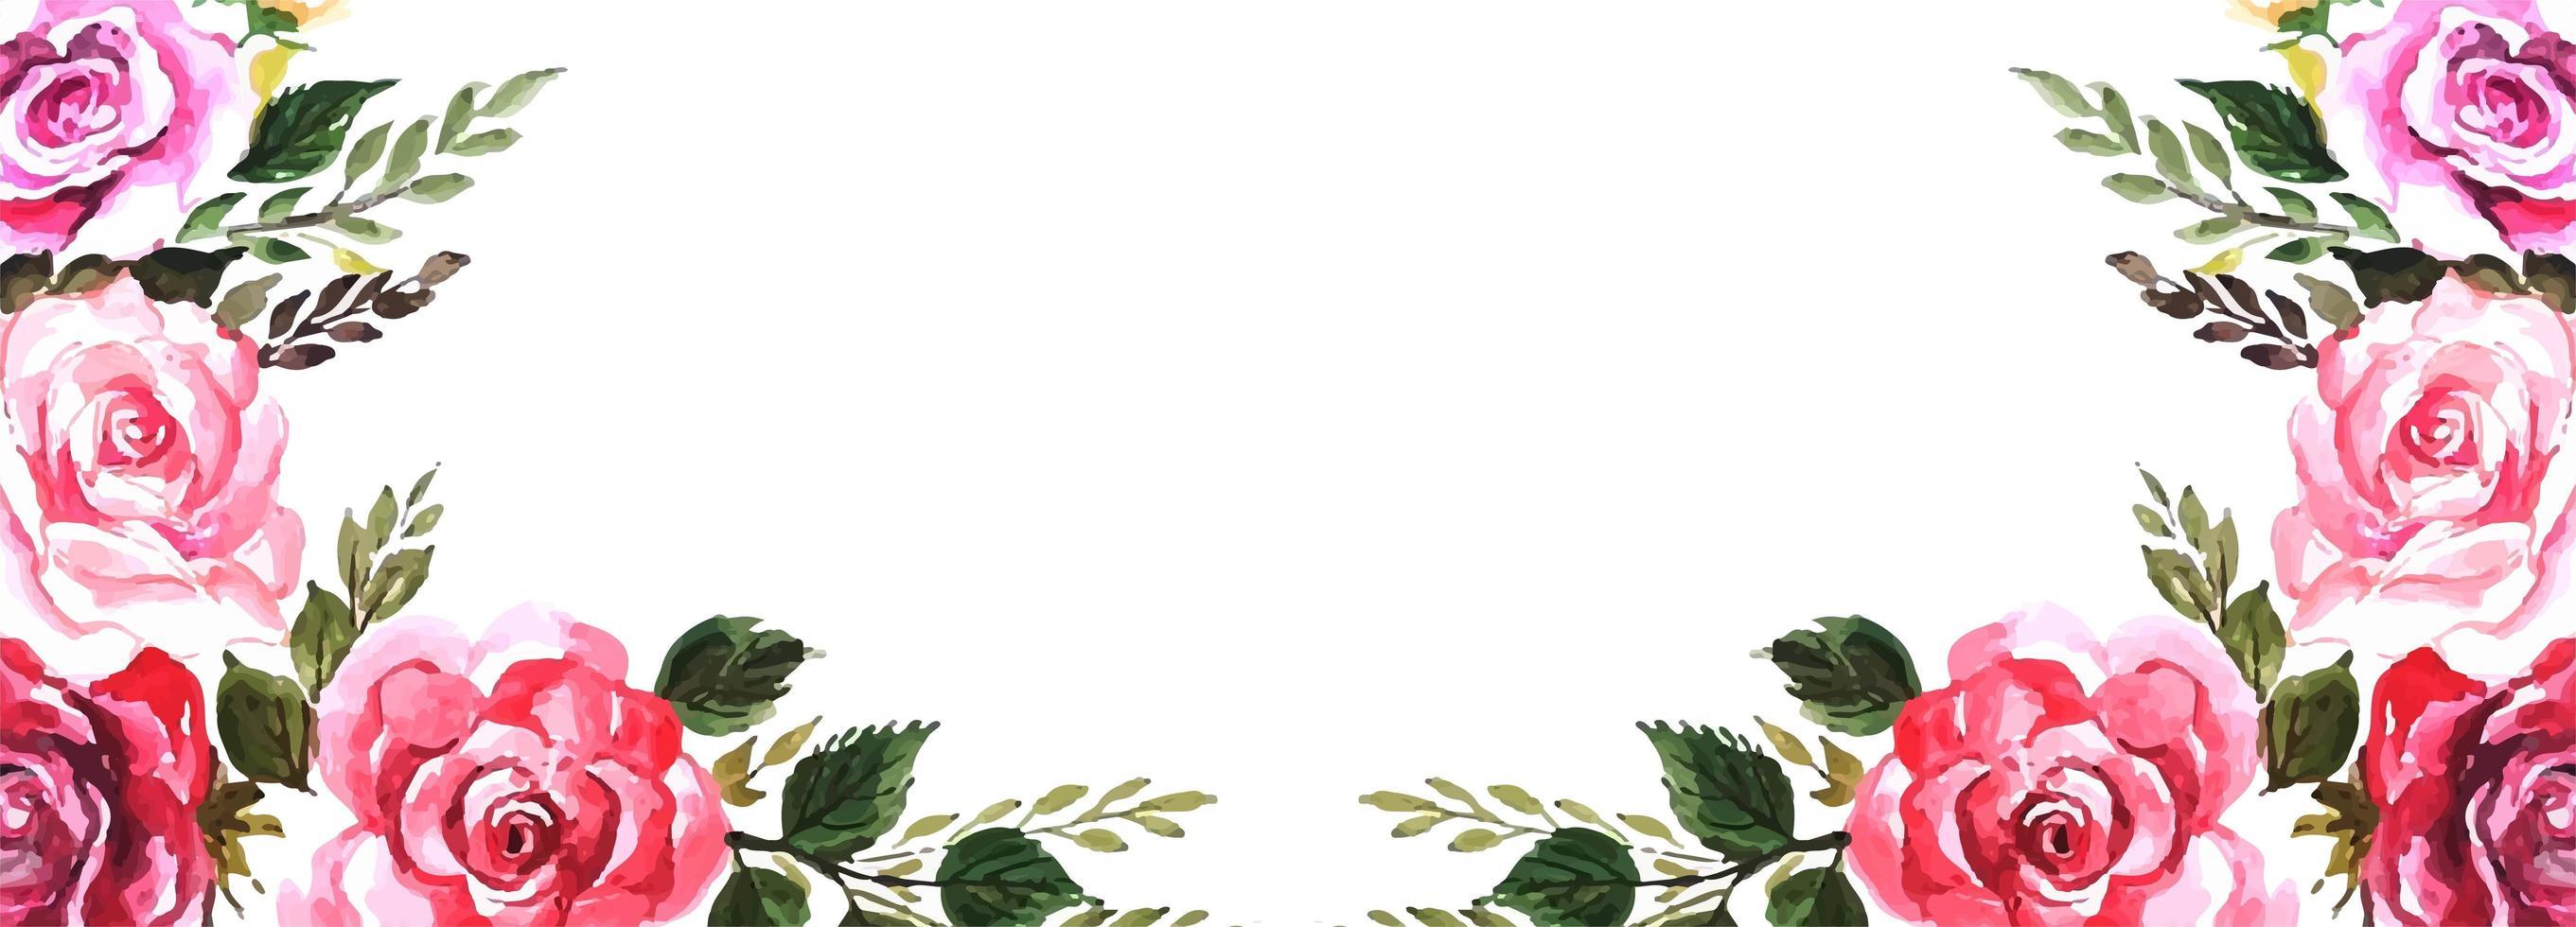 Elegant flowers background vector